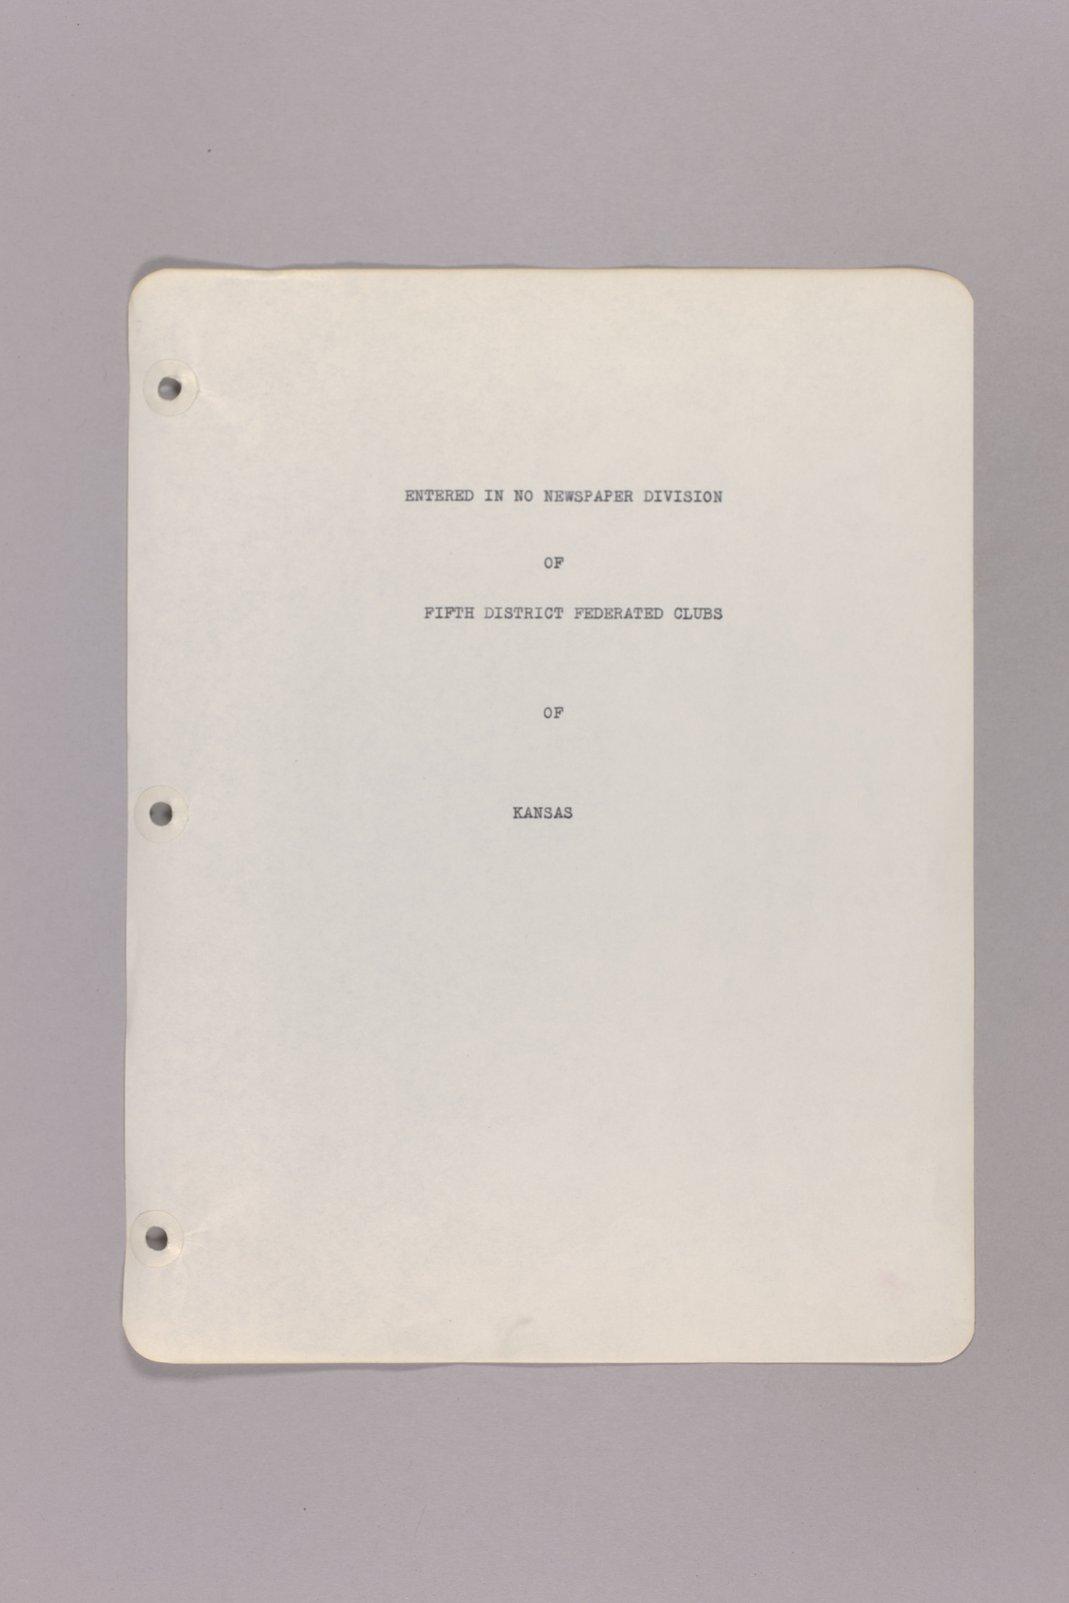 Goddard Woman's Club pressbook - Prepface: Fifth Distriict Federated Clubs Kansas